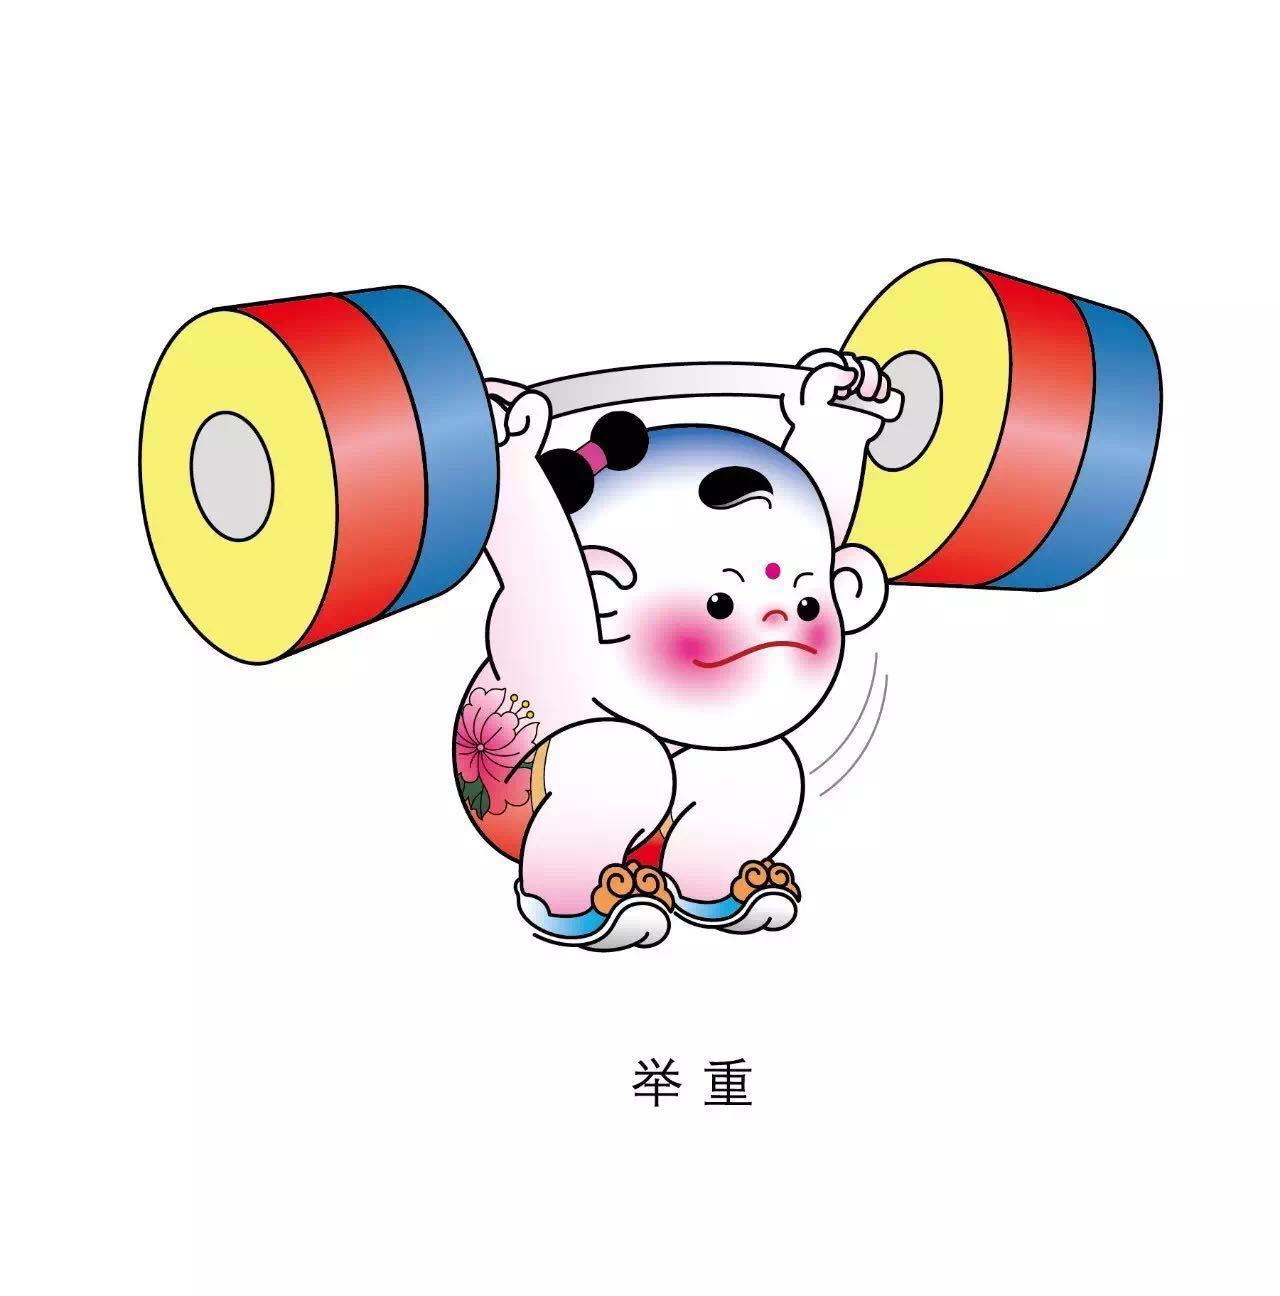 蠢萌��/i�lo;�#9`����yc%���yᢹi-:`�_雷人or蠢萌?全运会吉祥物发布毁誉参半